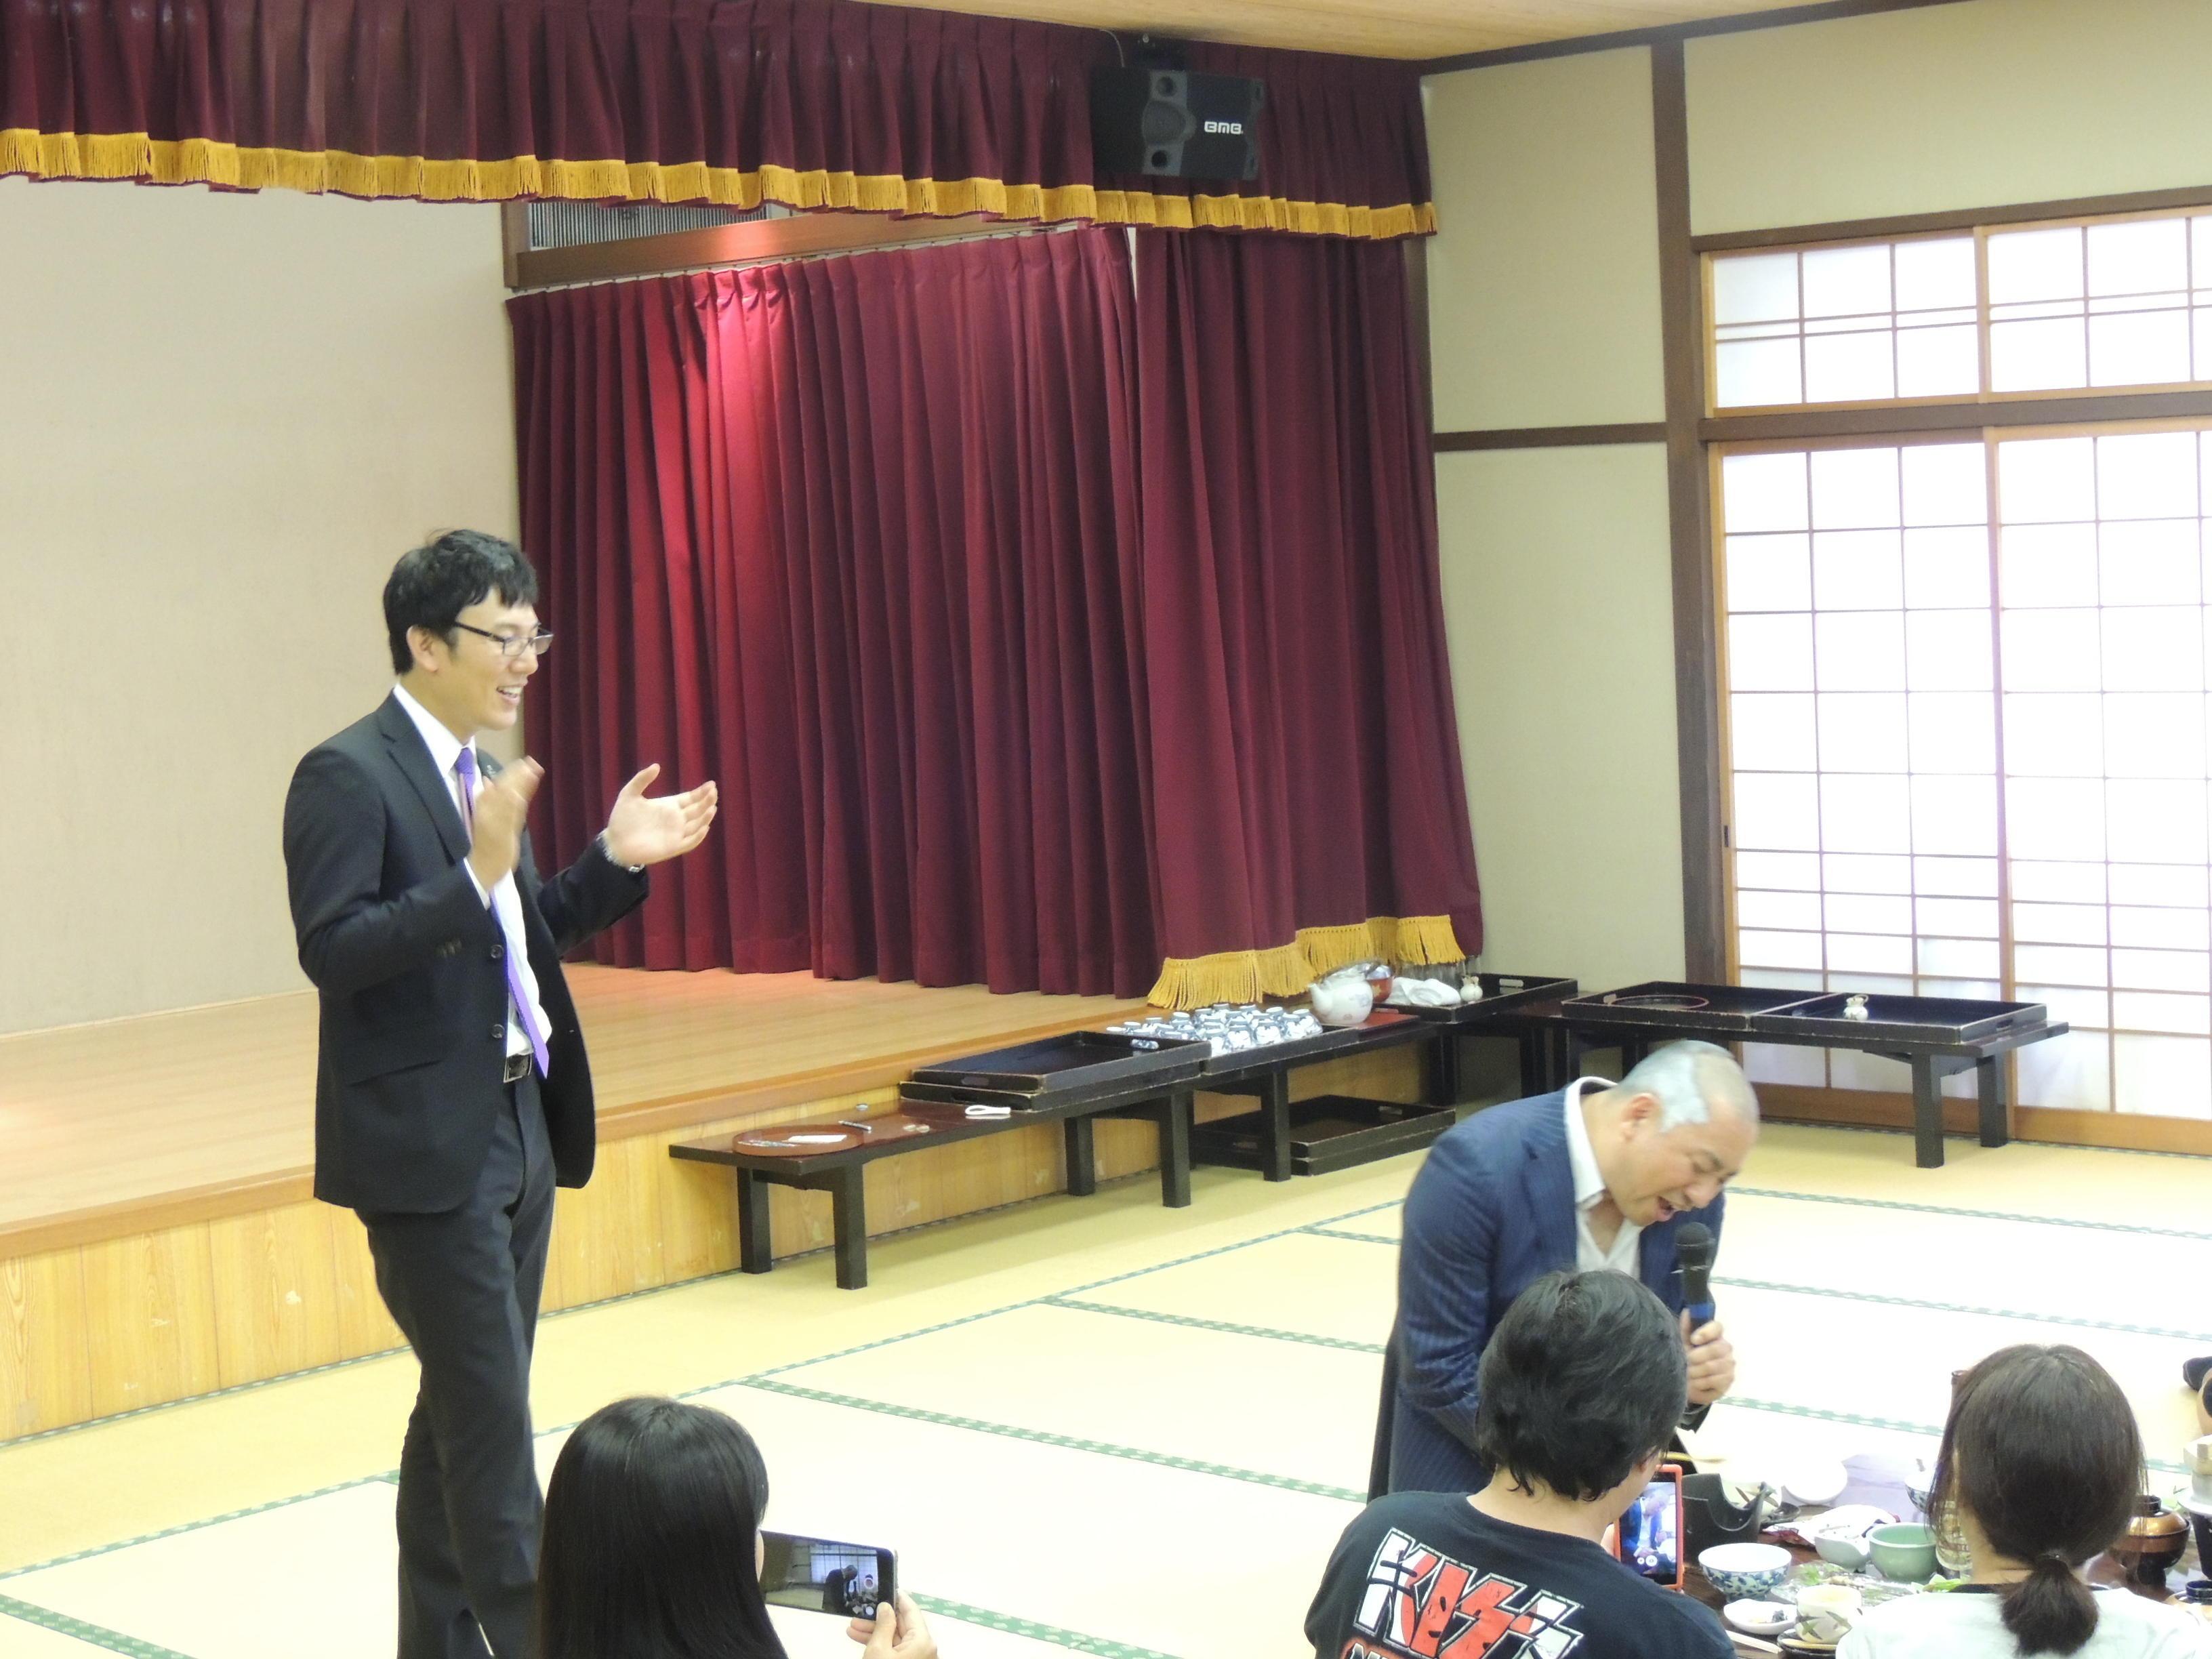 http://news.yoshimoto.co.jp/20160903210413-22c79423c8a6598b58c3c0bae6266b1c6ea9e90f.jpg